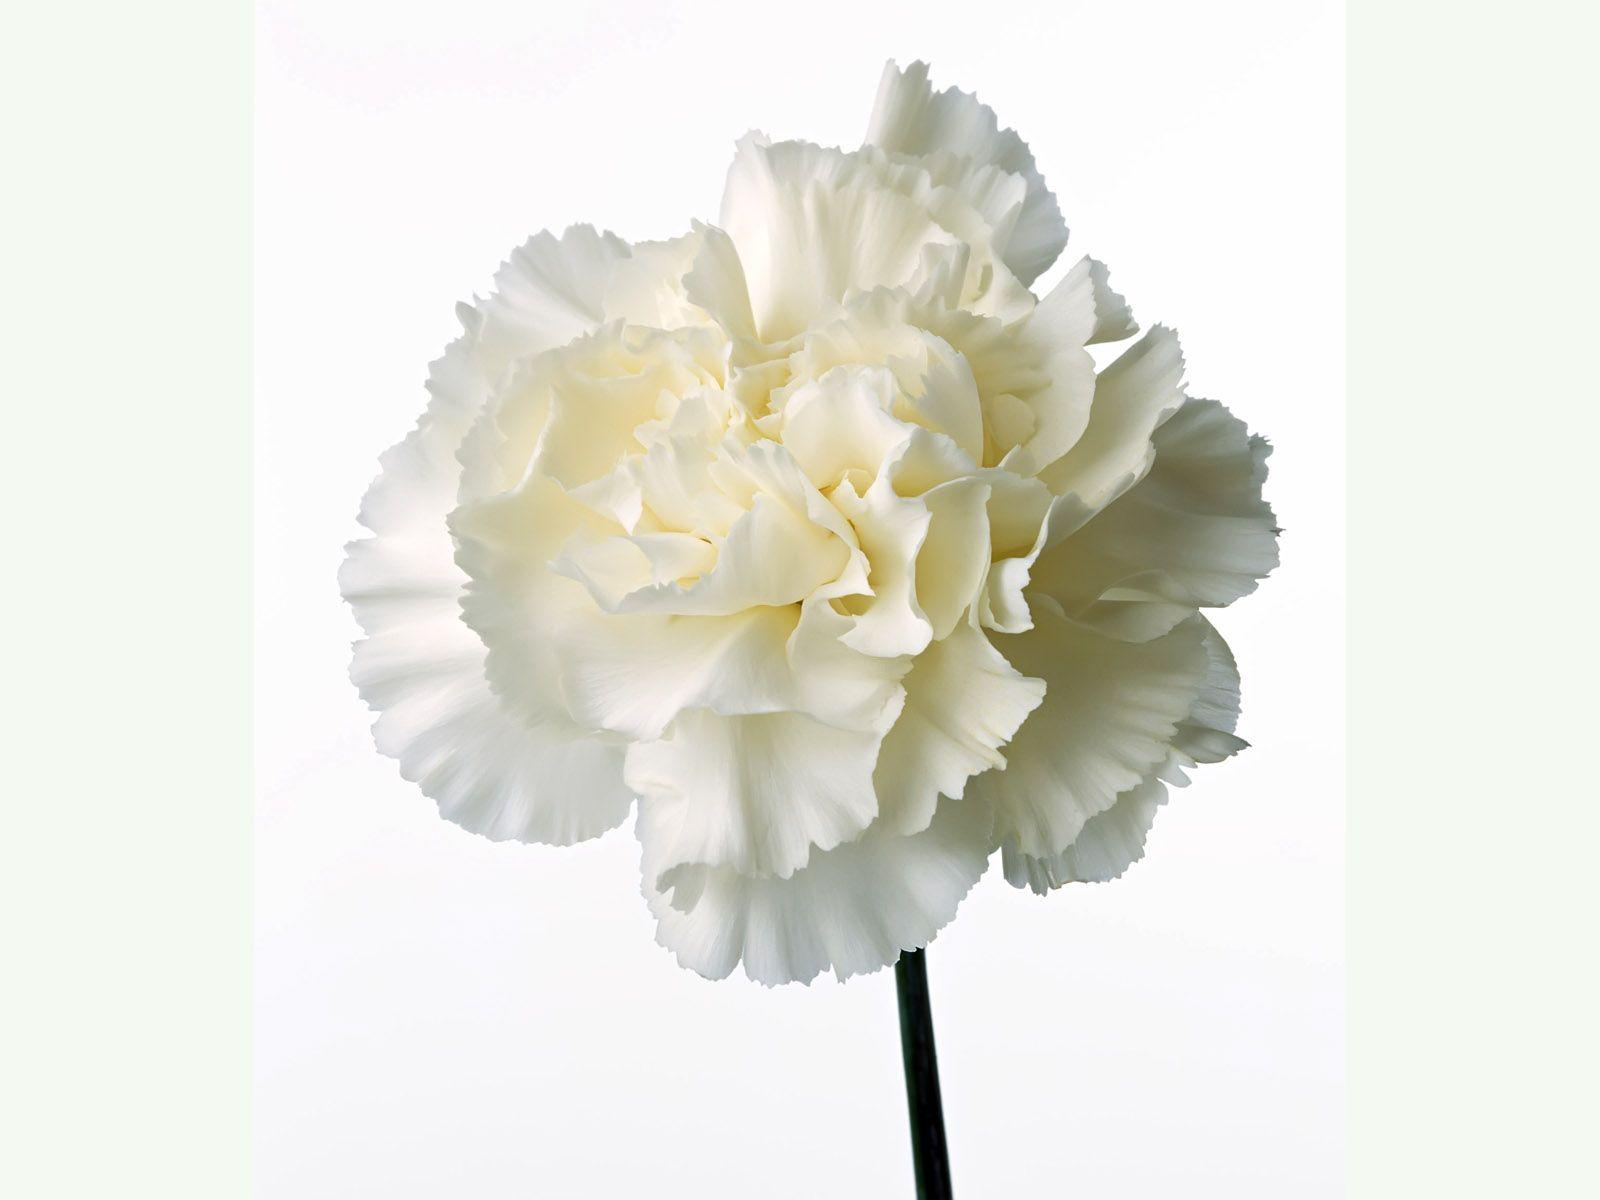 Carnation Flowers 4634 Carnation Flowers White Carnation Carnation Flower Carnations